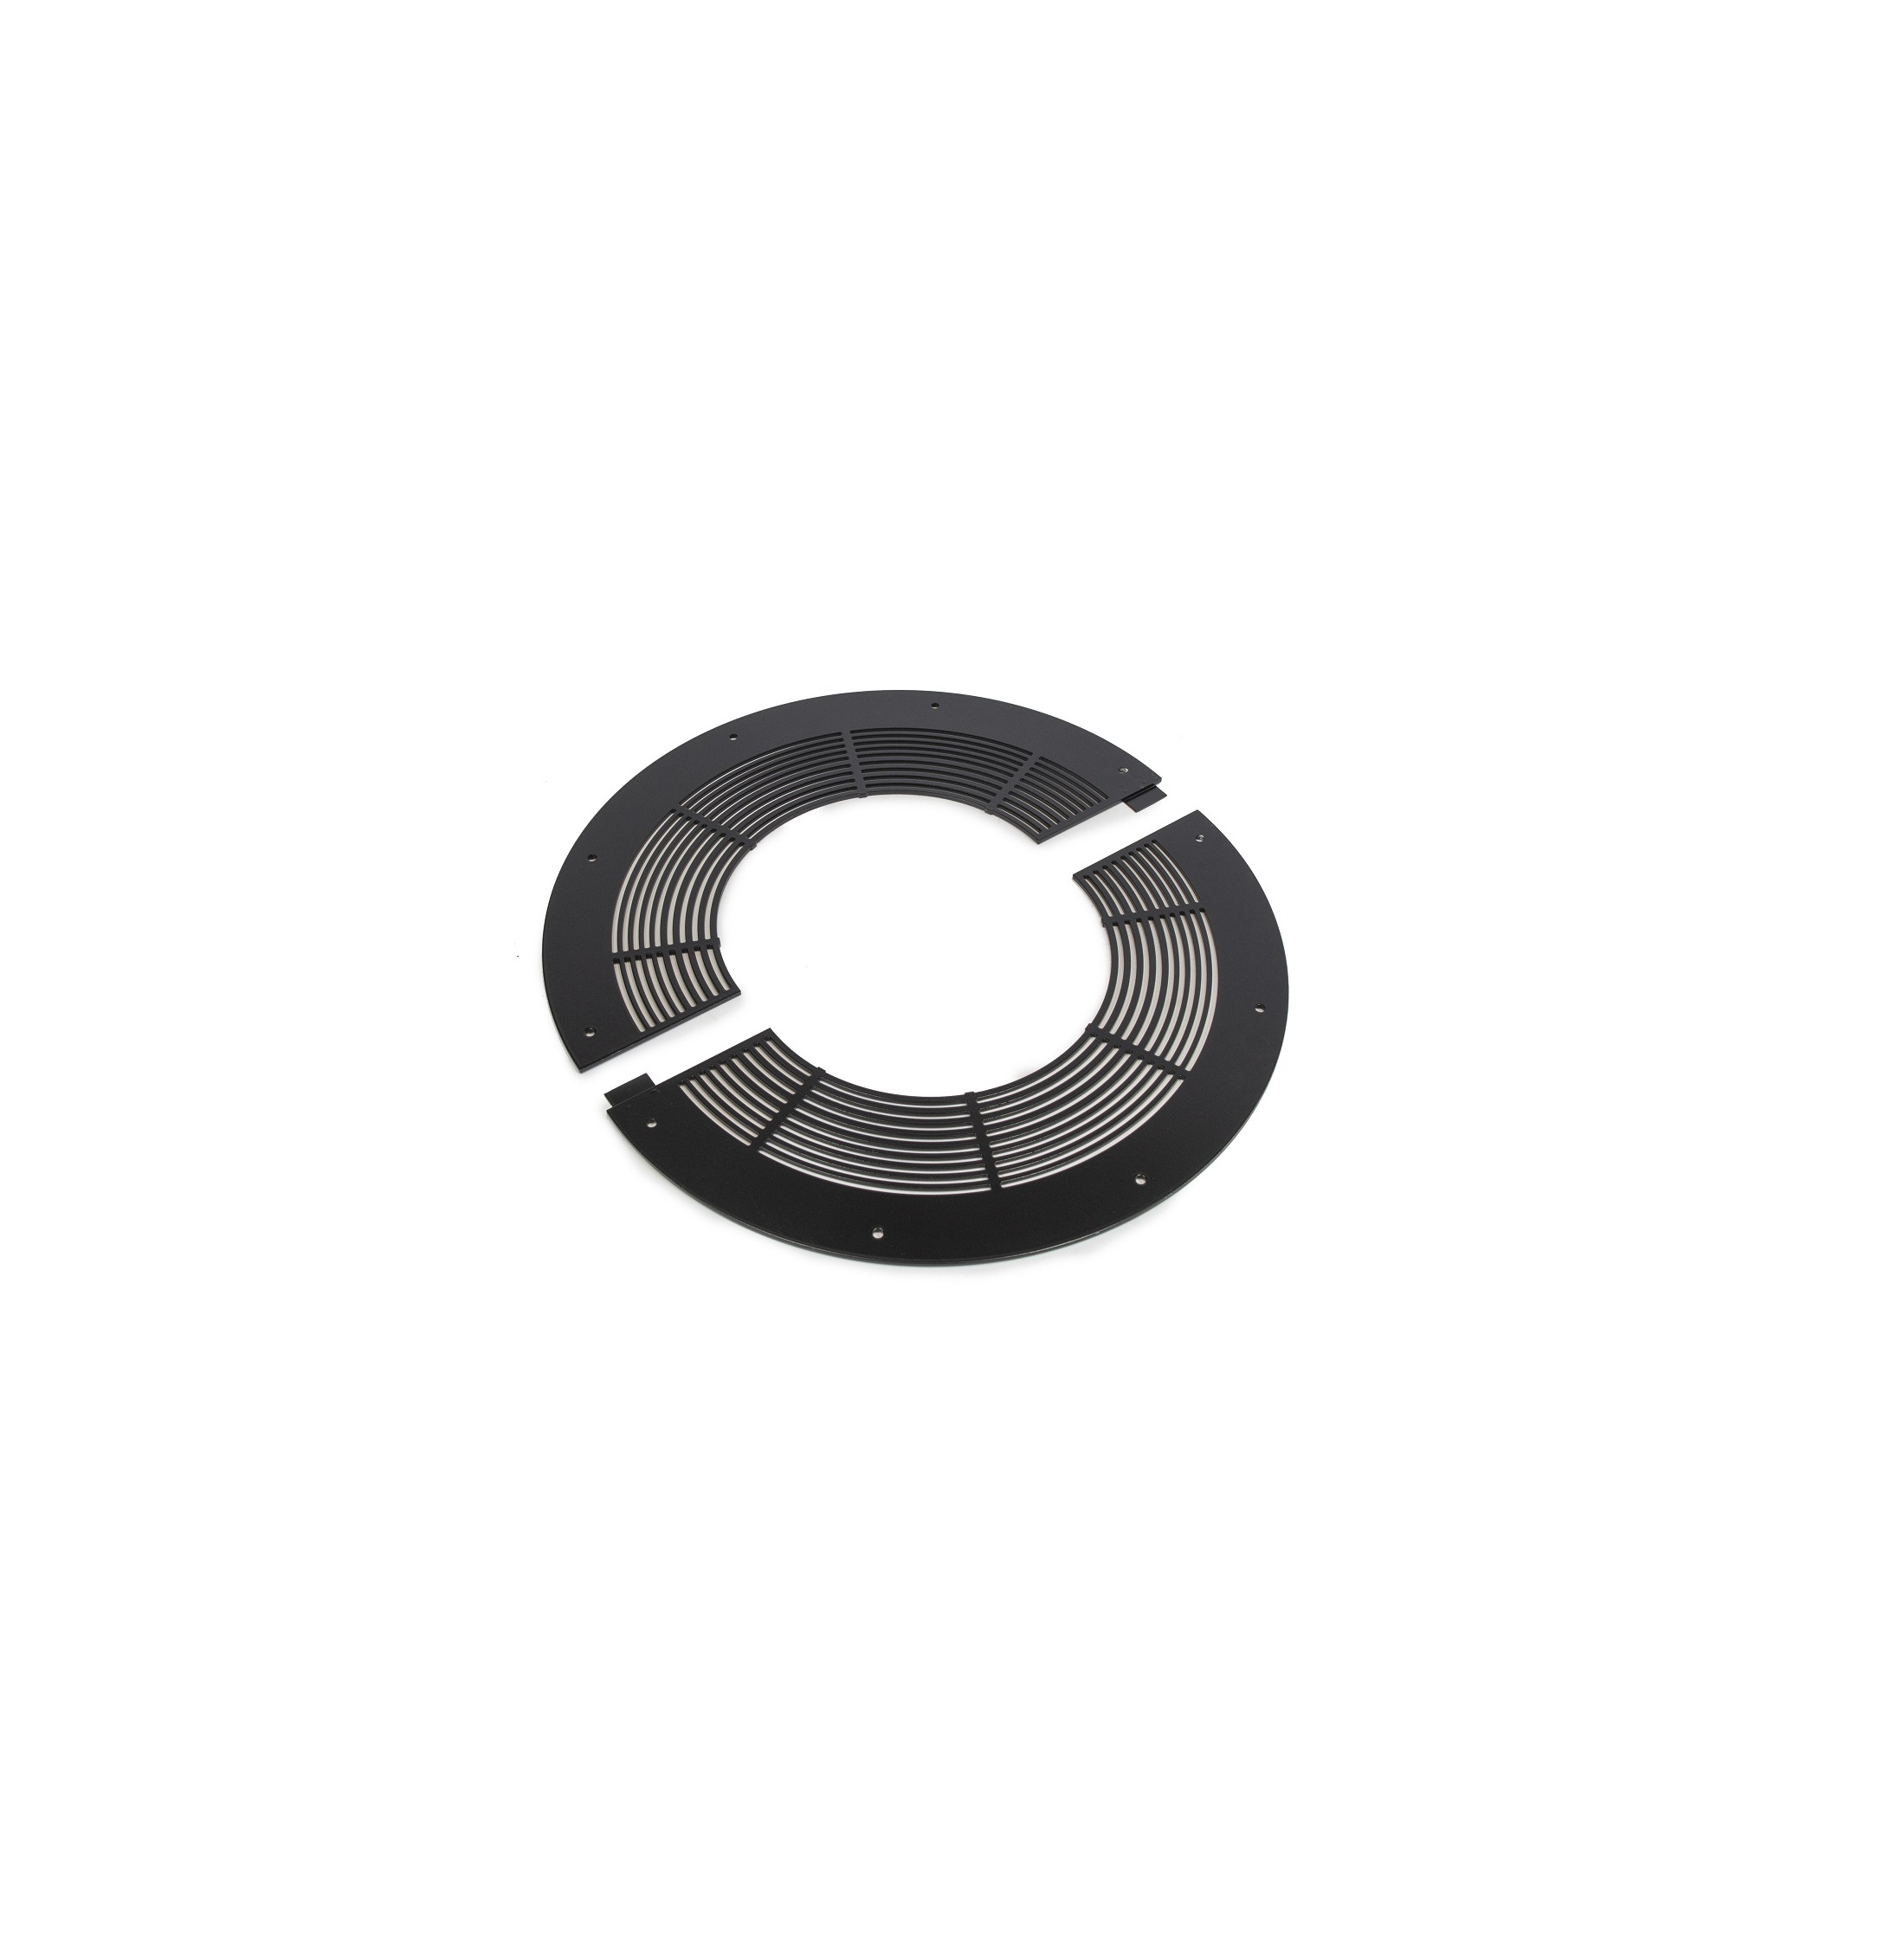 Ventilated Round Firestop Plate 2pc - Schiedel Twin Wall Flue - Black